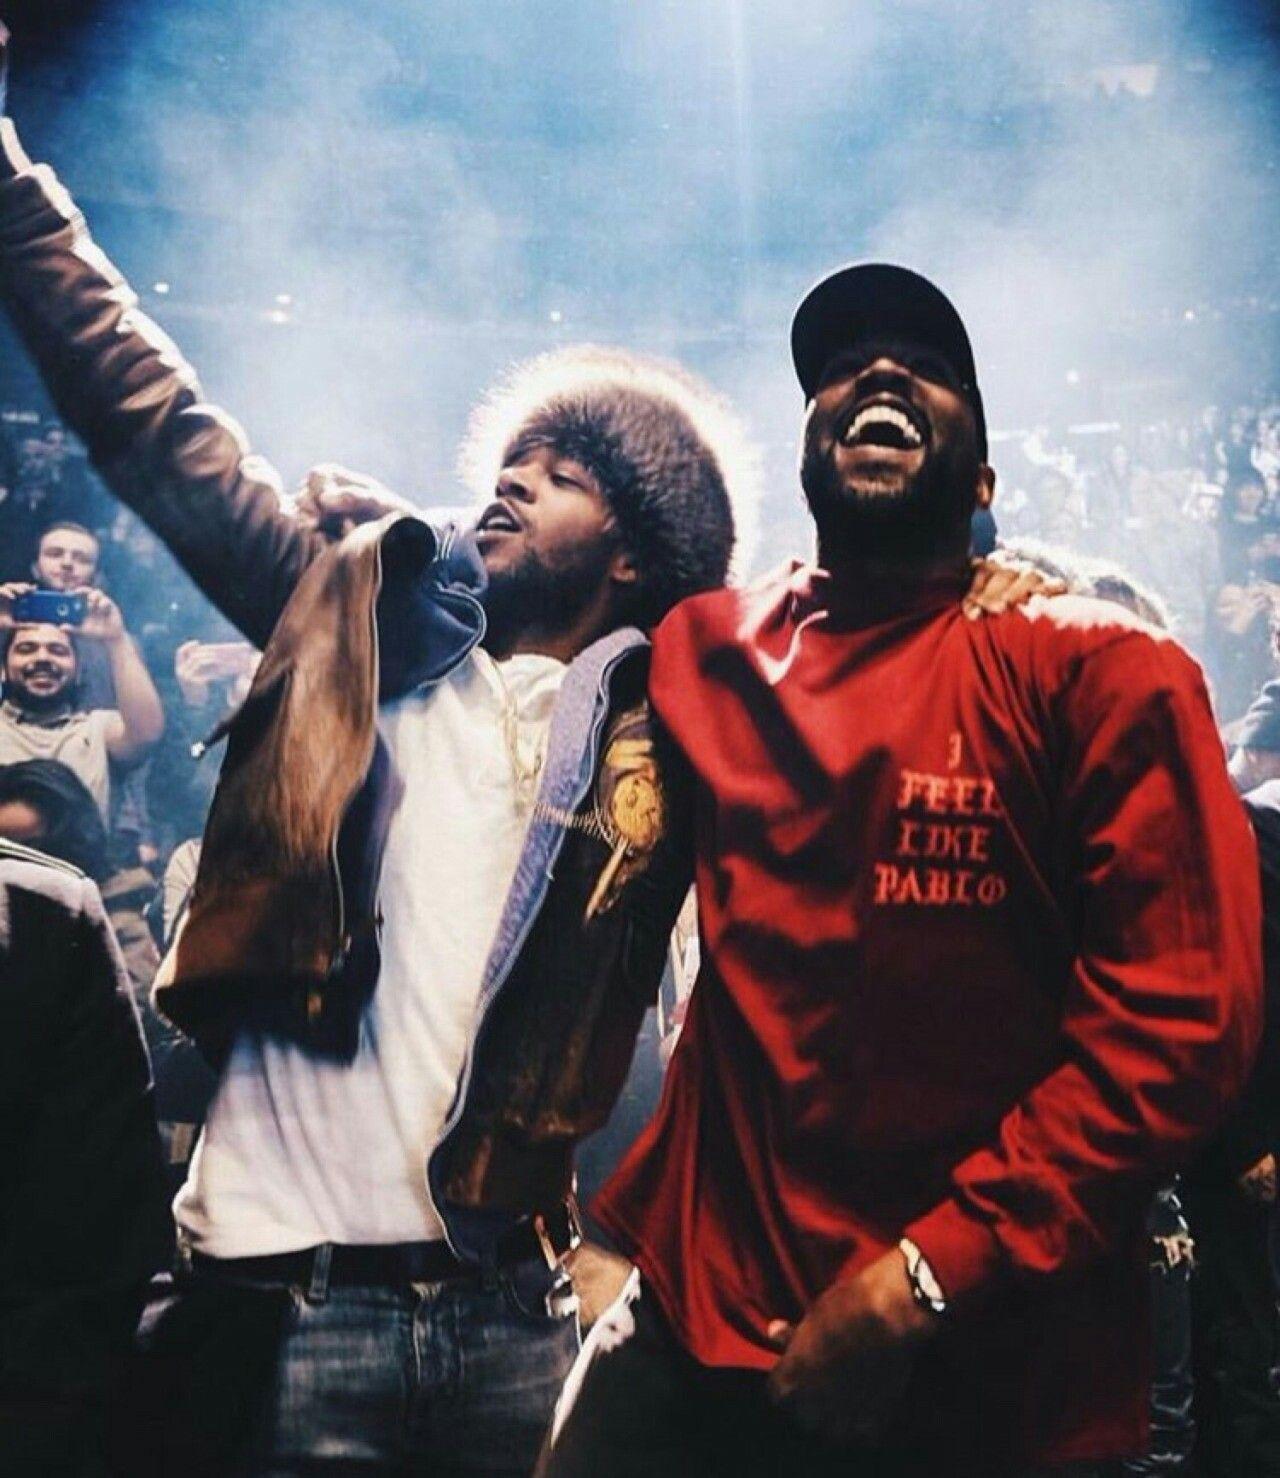 Kid Cudi Kanye West Kanye Kid Cudi Kid Cudi Kanye West Kanye West Kids